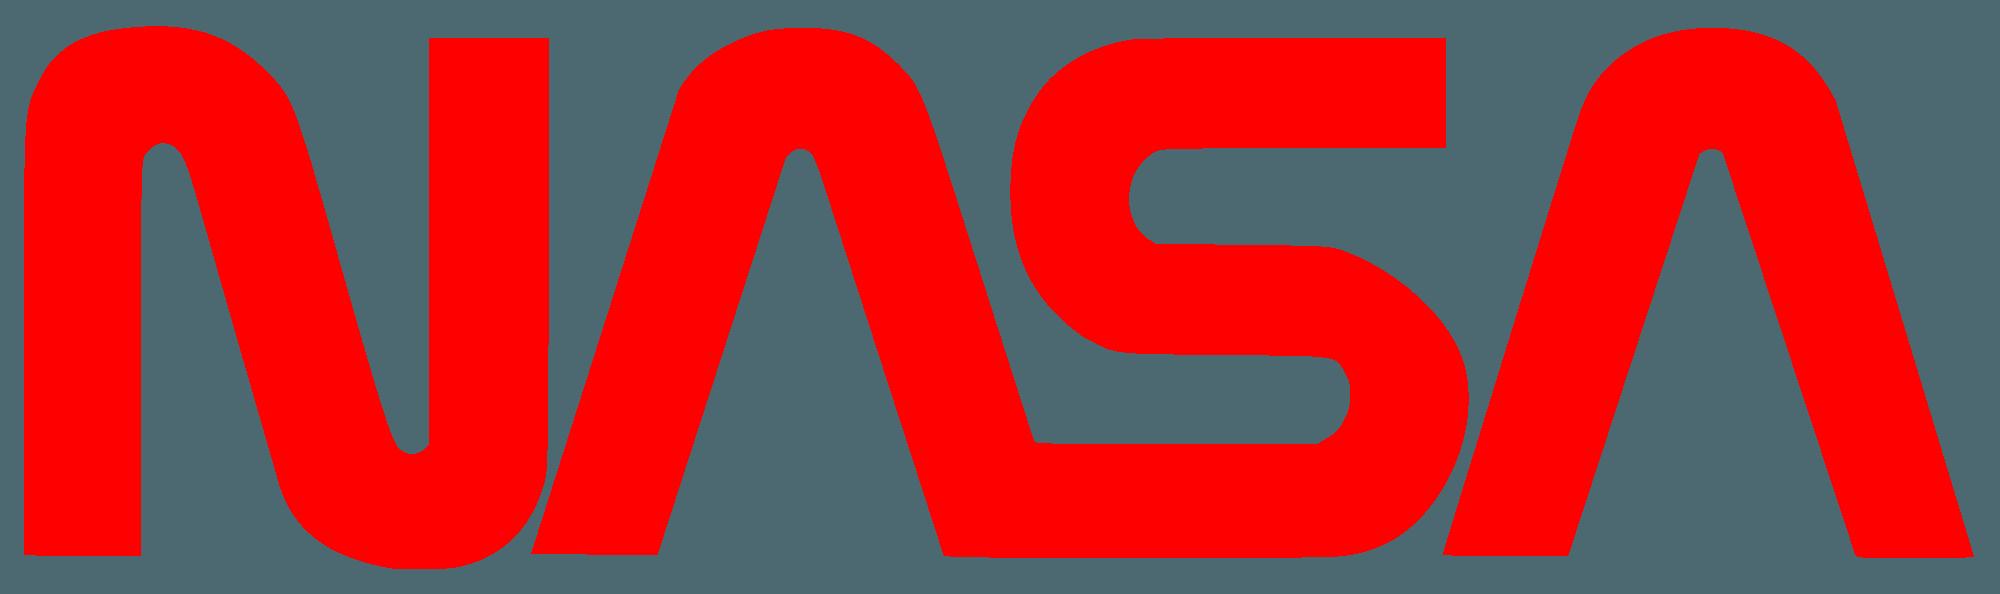 nasa worm logo - photo #17